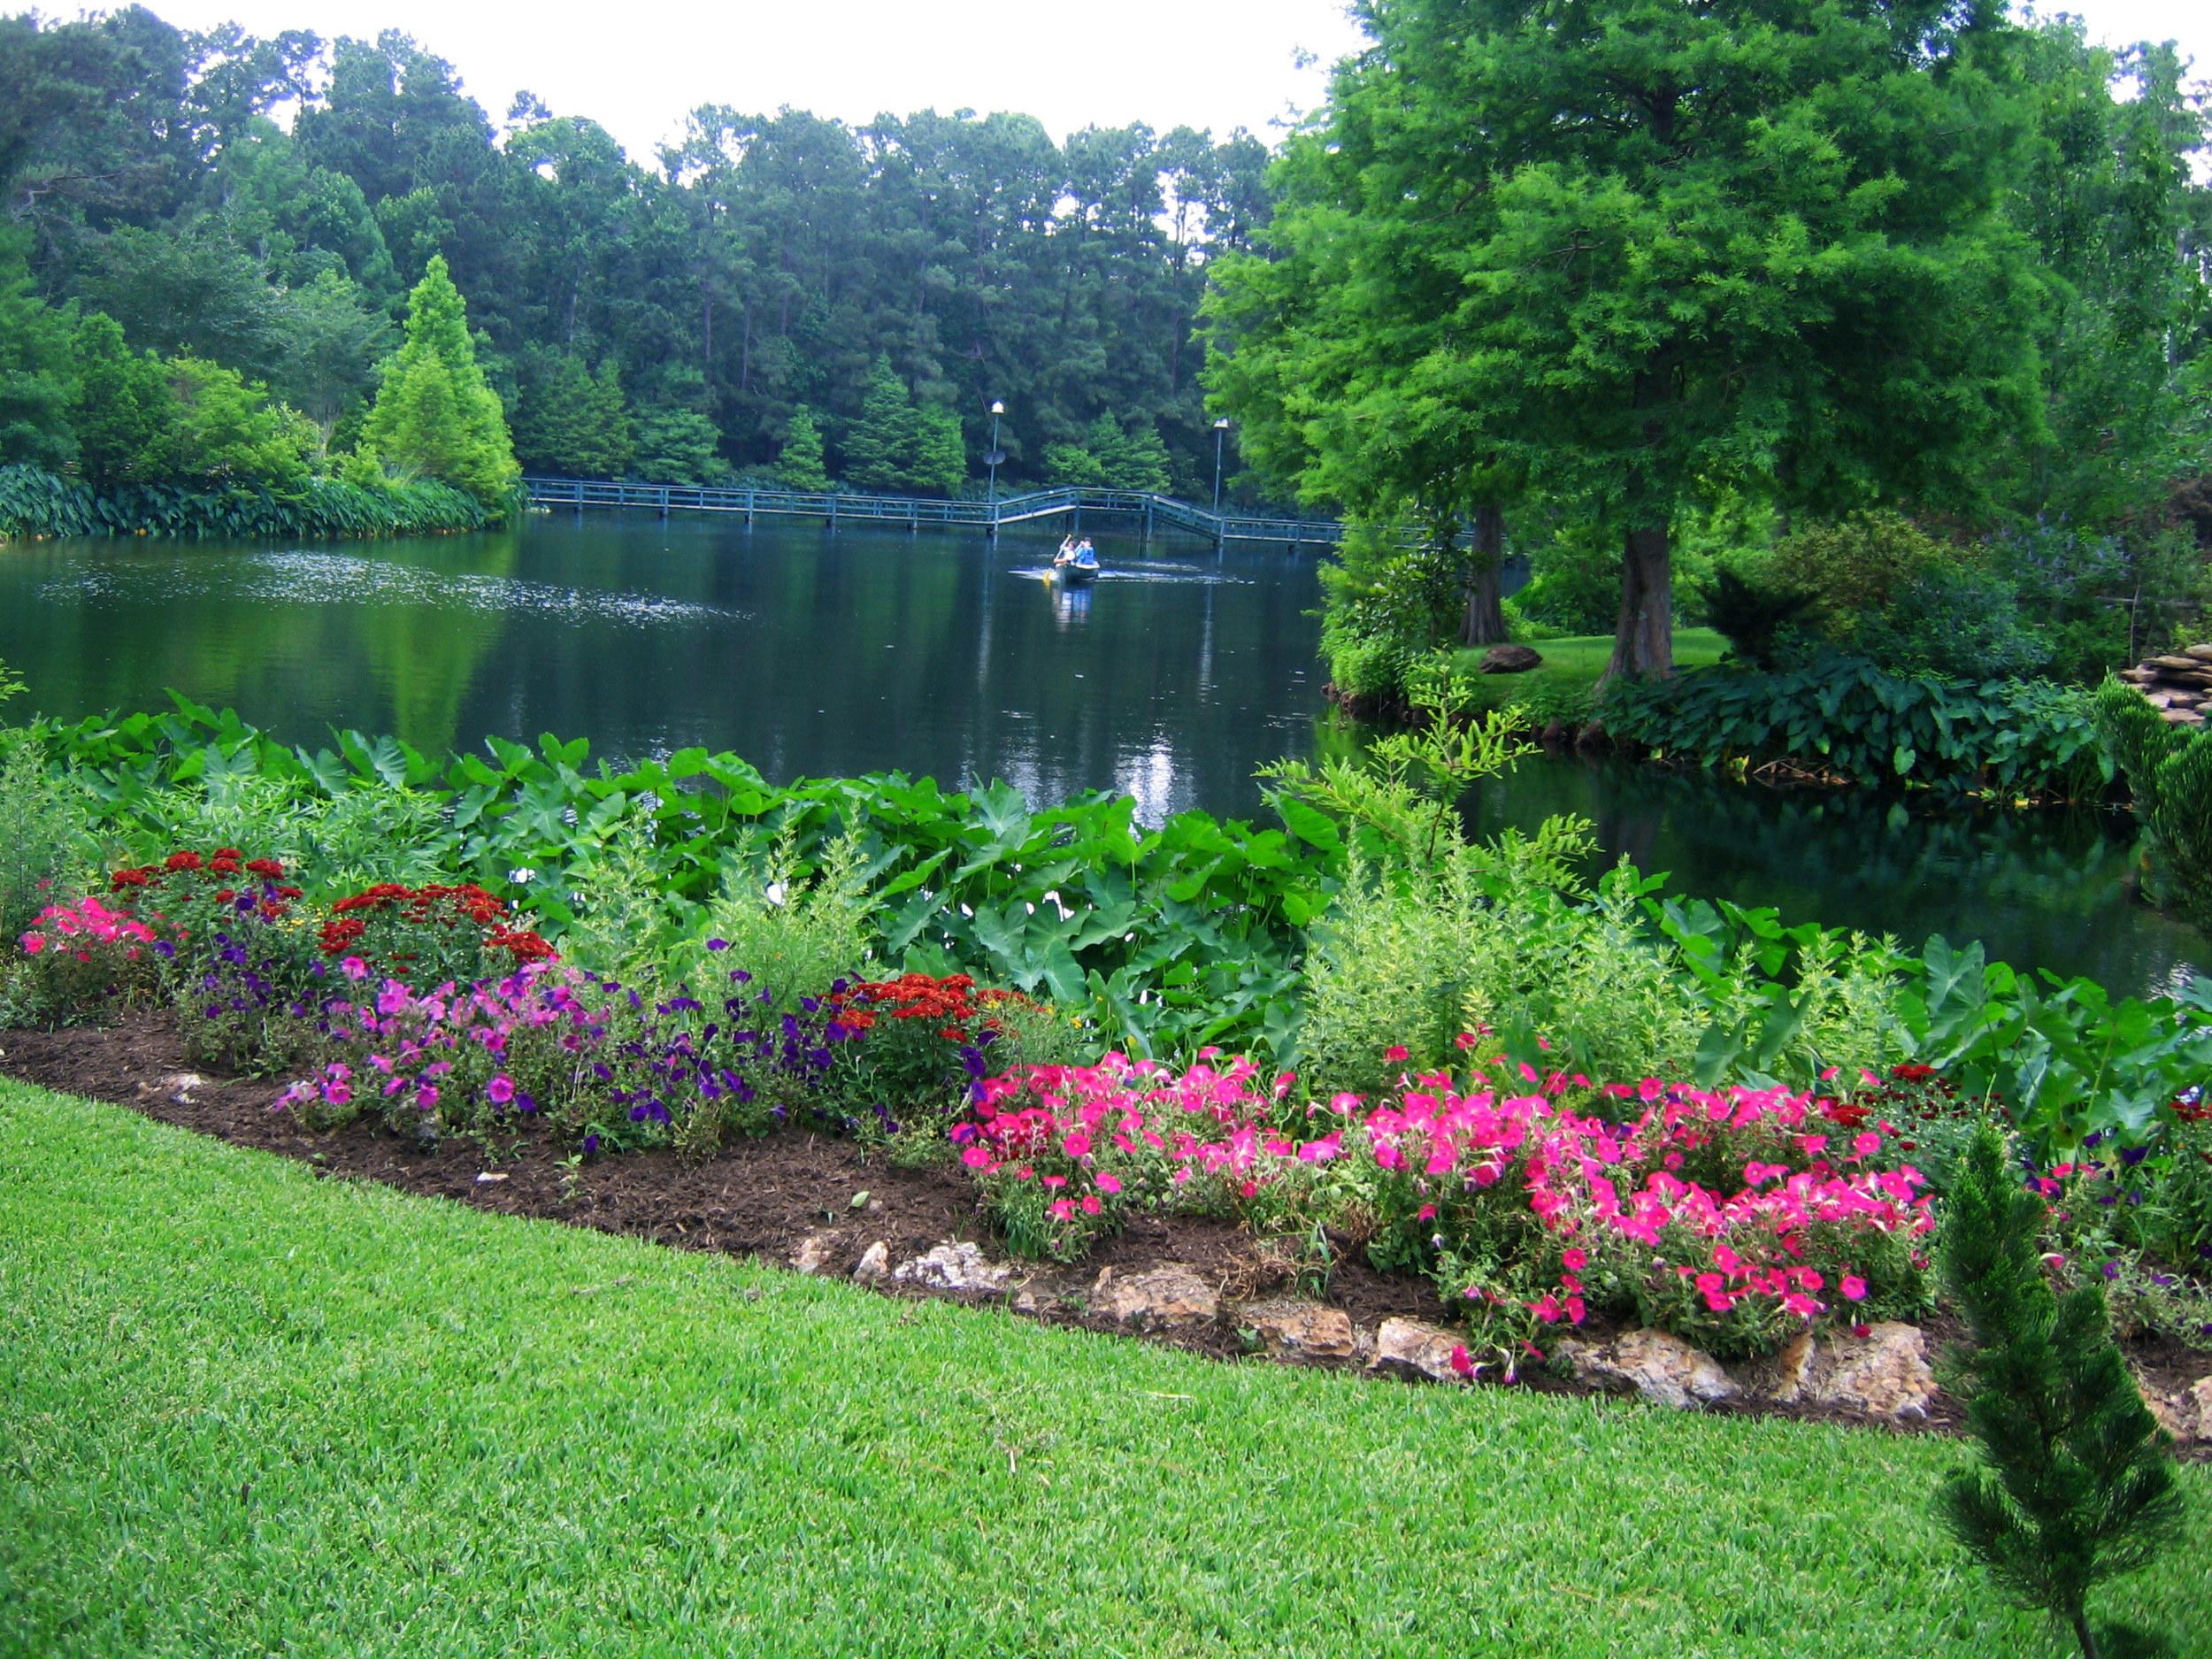 Circle-Lake-beauty-and-peace-(web-front-page)1.jpg